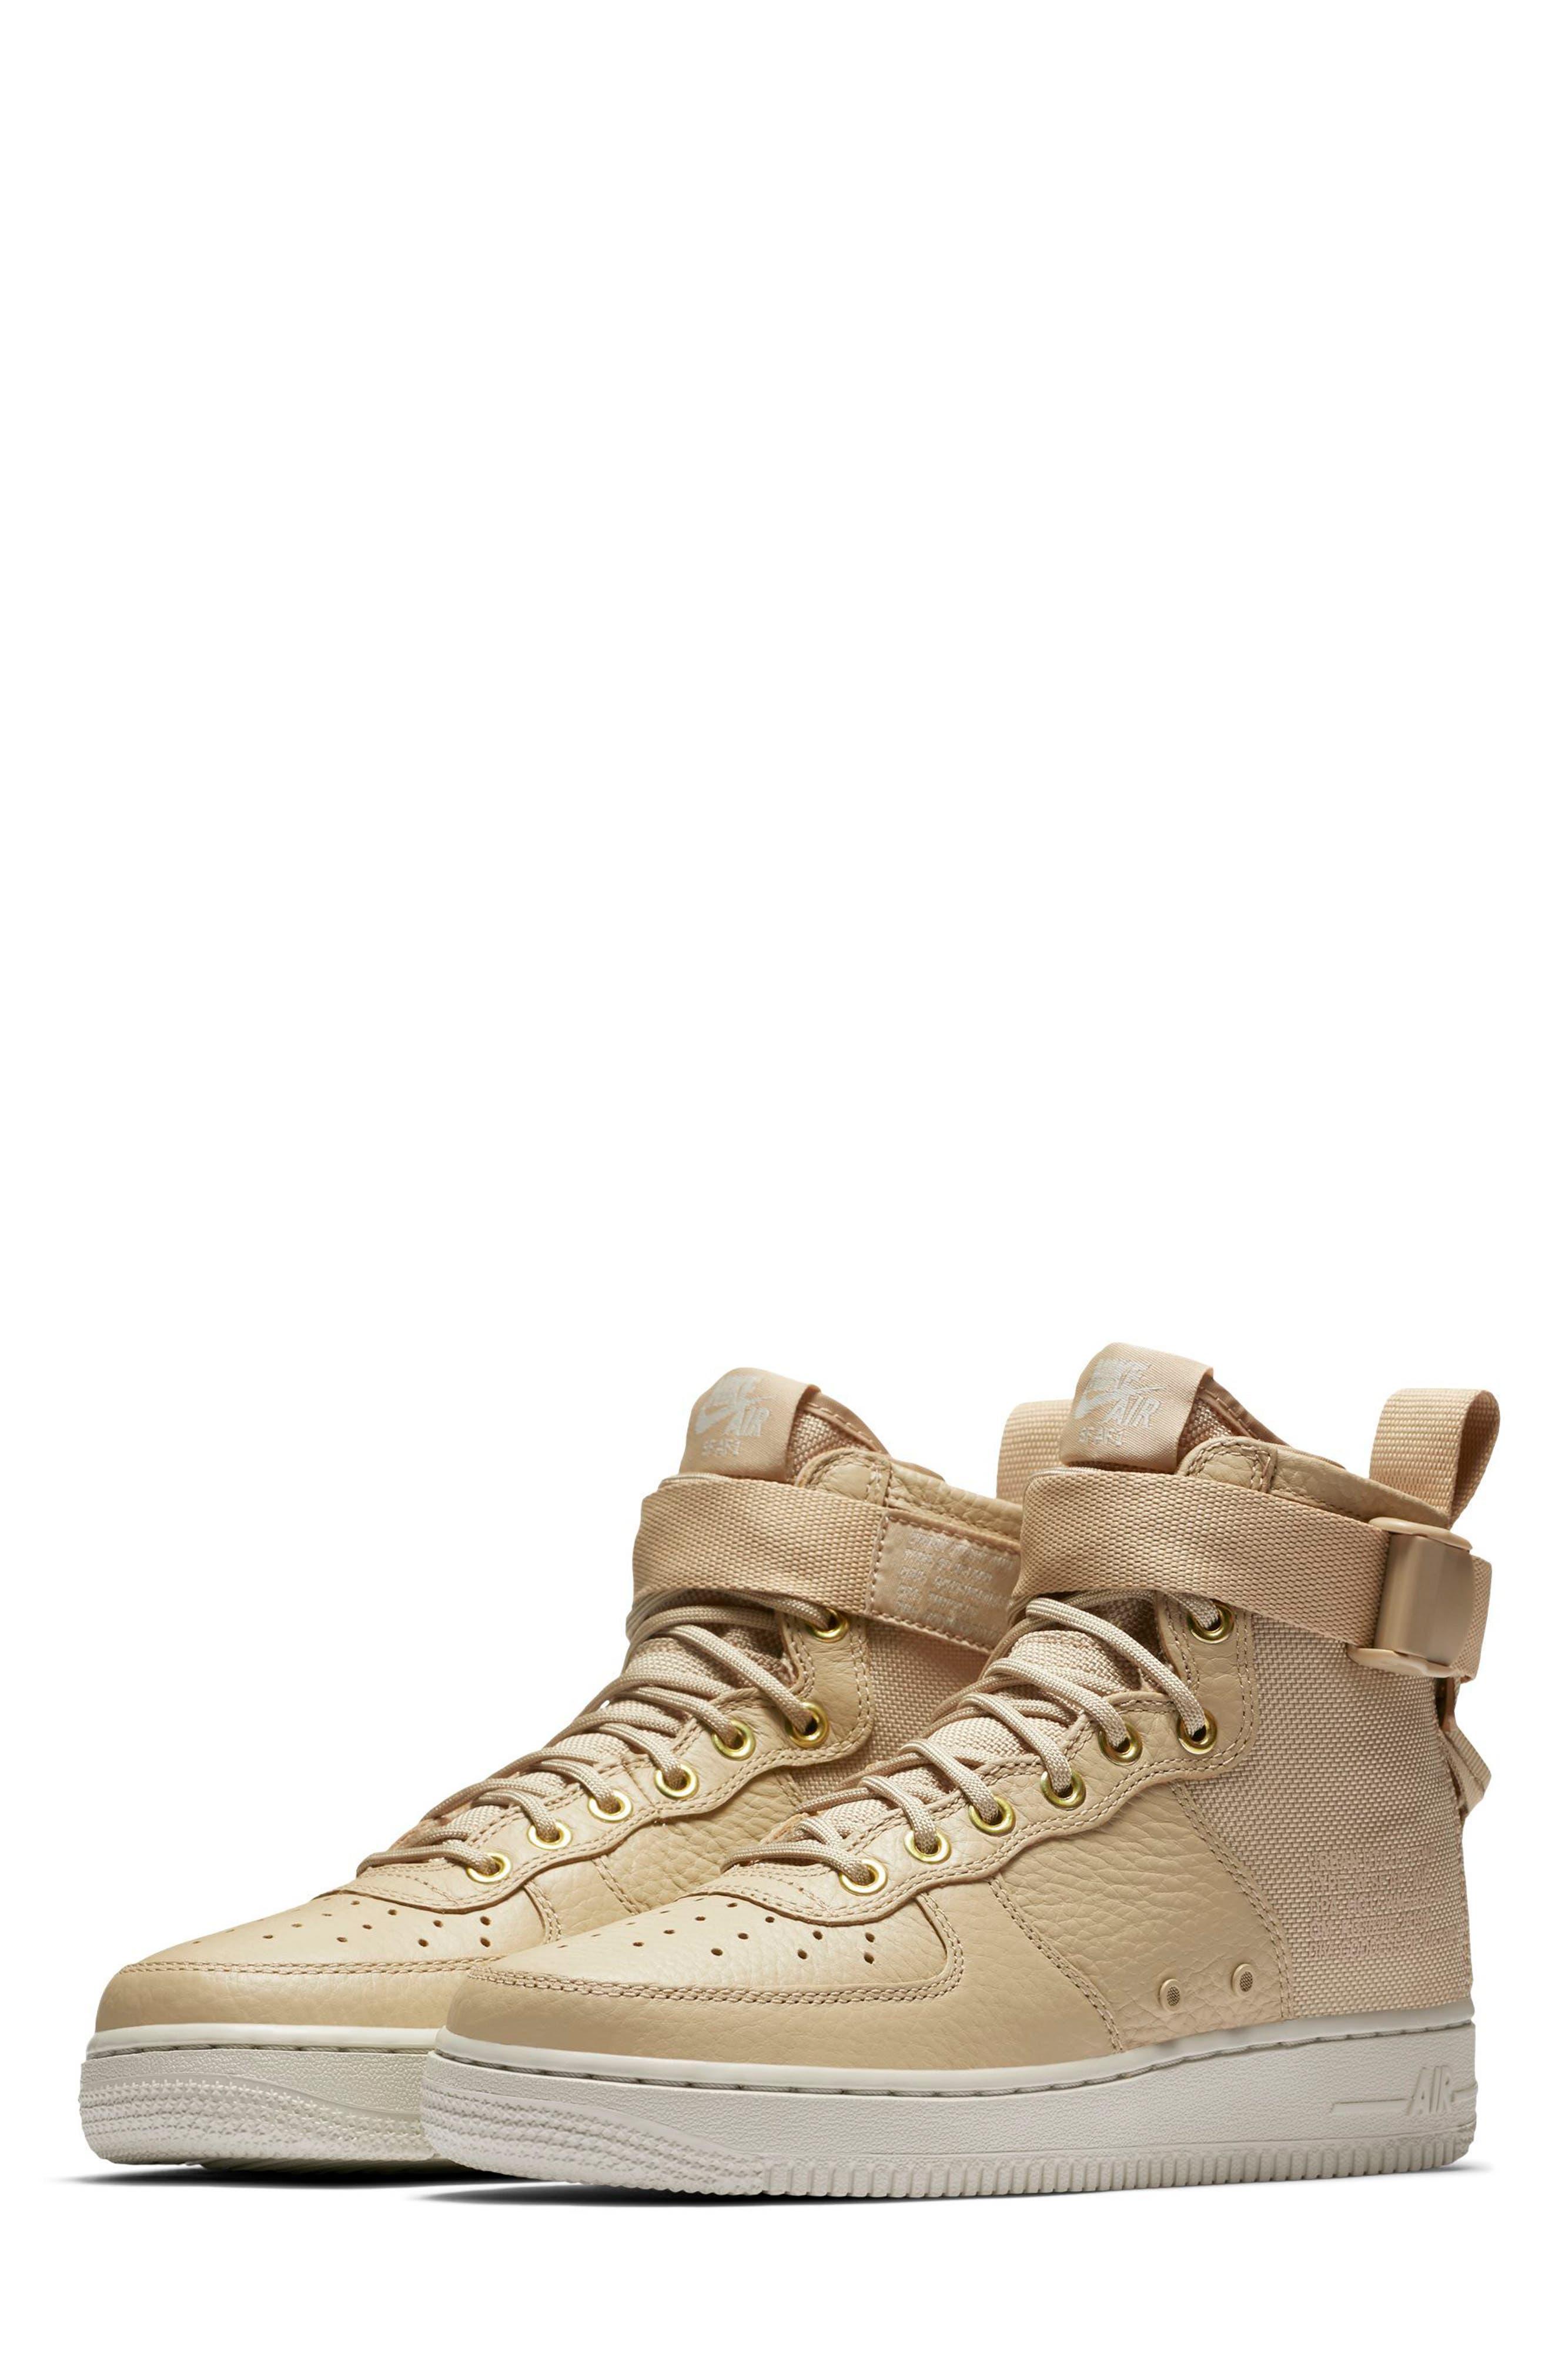 SF Air Force 1 Mid Sneaker,                         Main,                         color, Mushroom/ Mushroom/ Light Bone